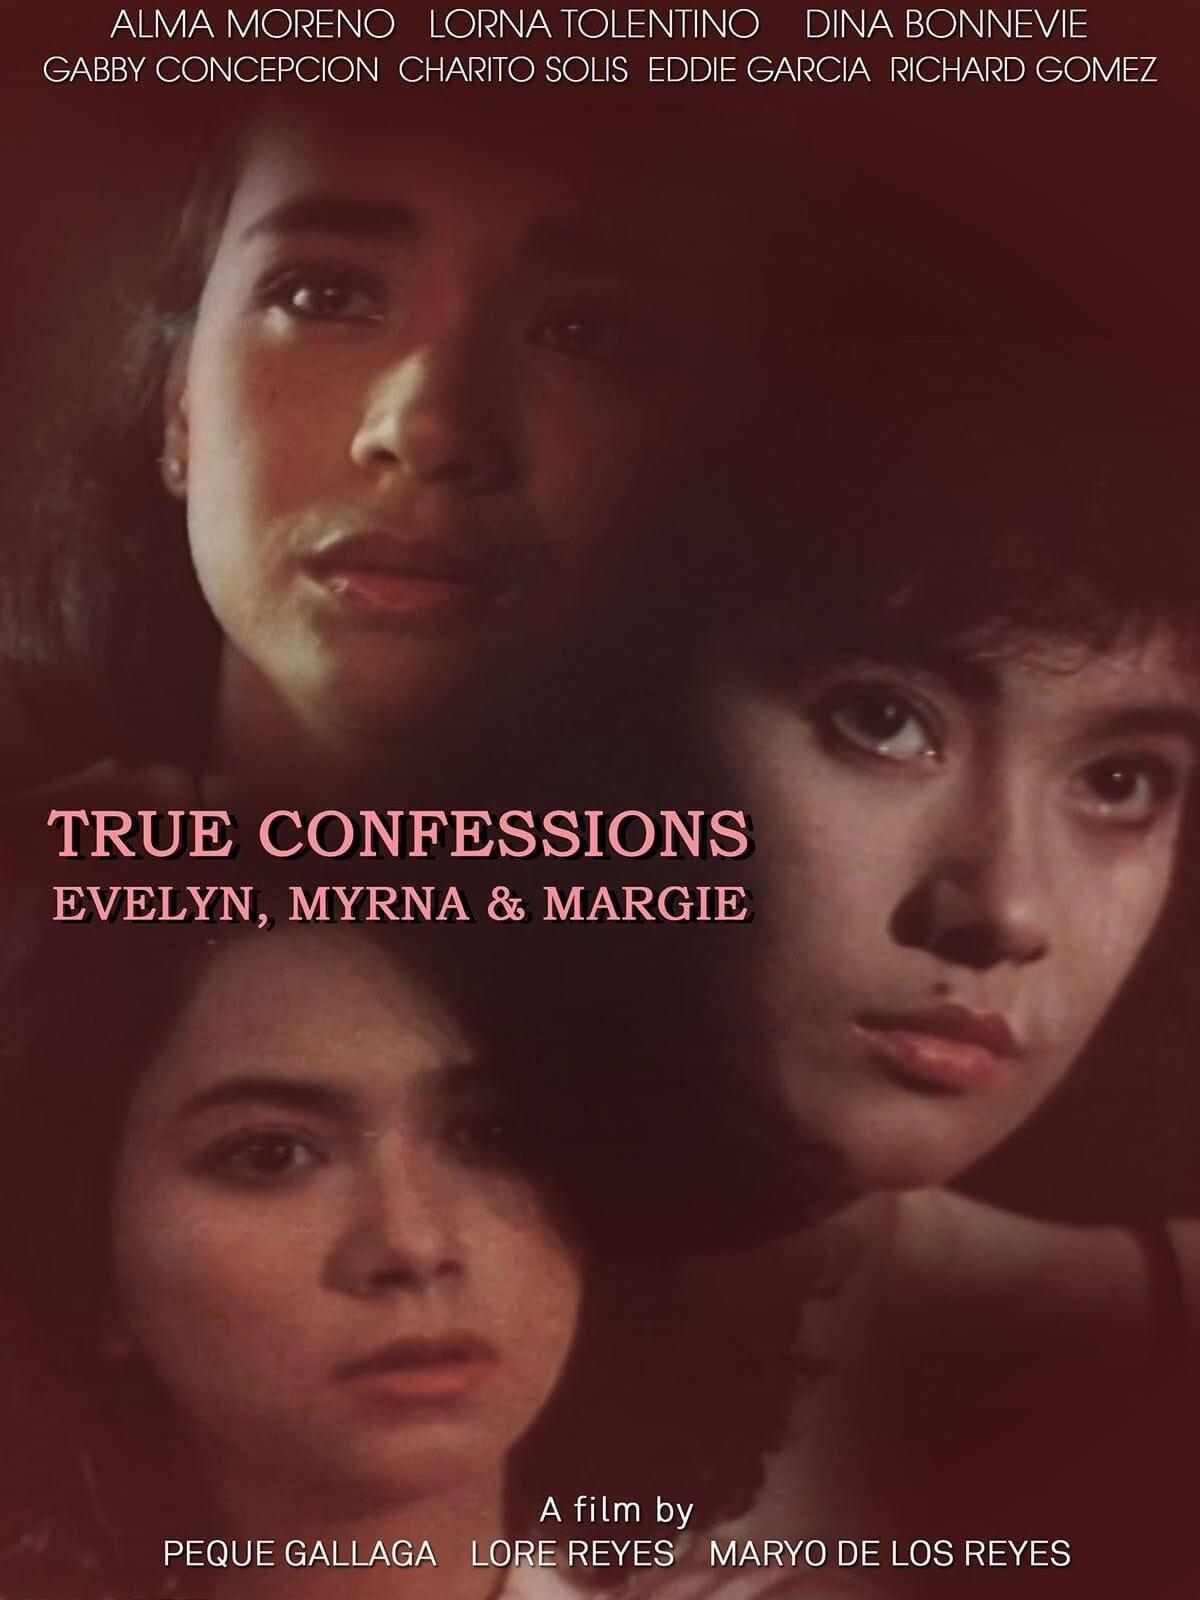 True Confessions: Evelyn, Myrna, & Margie